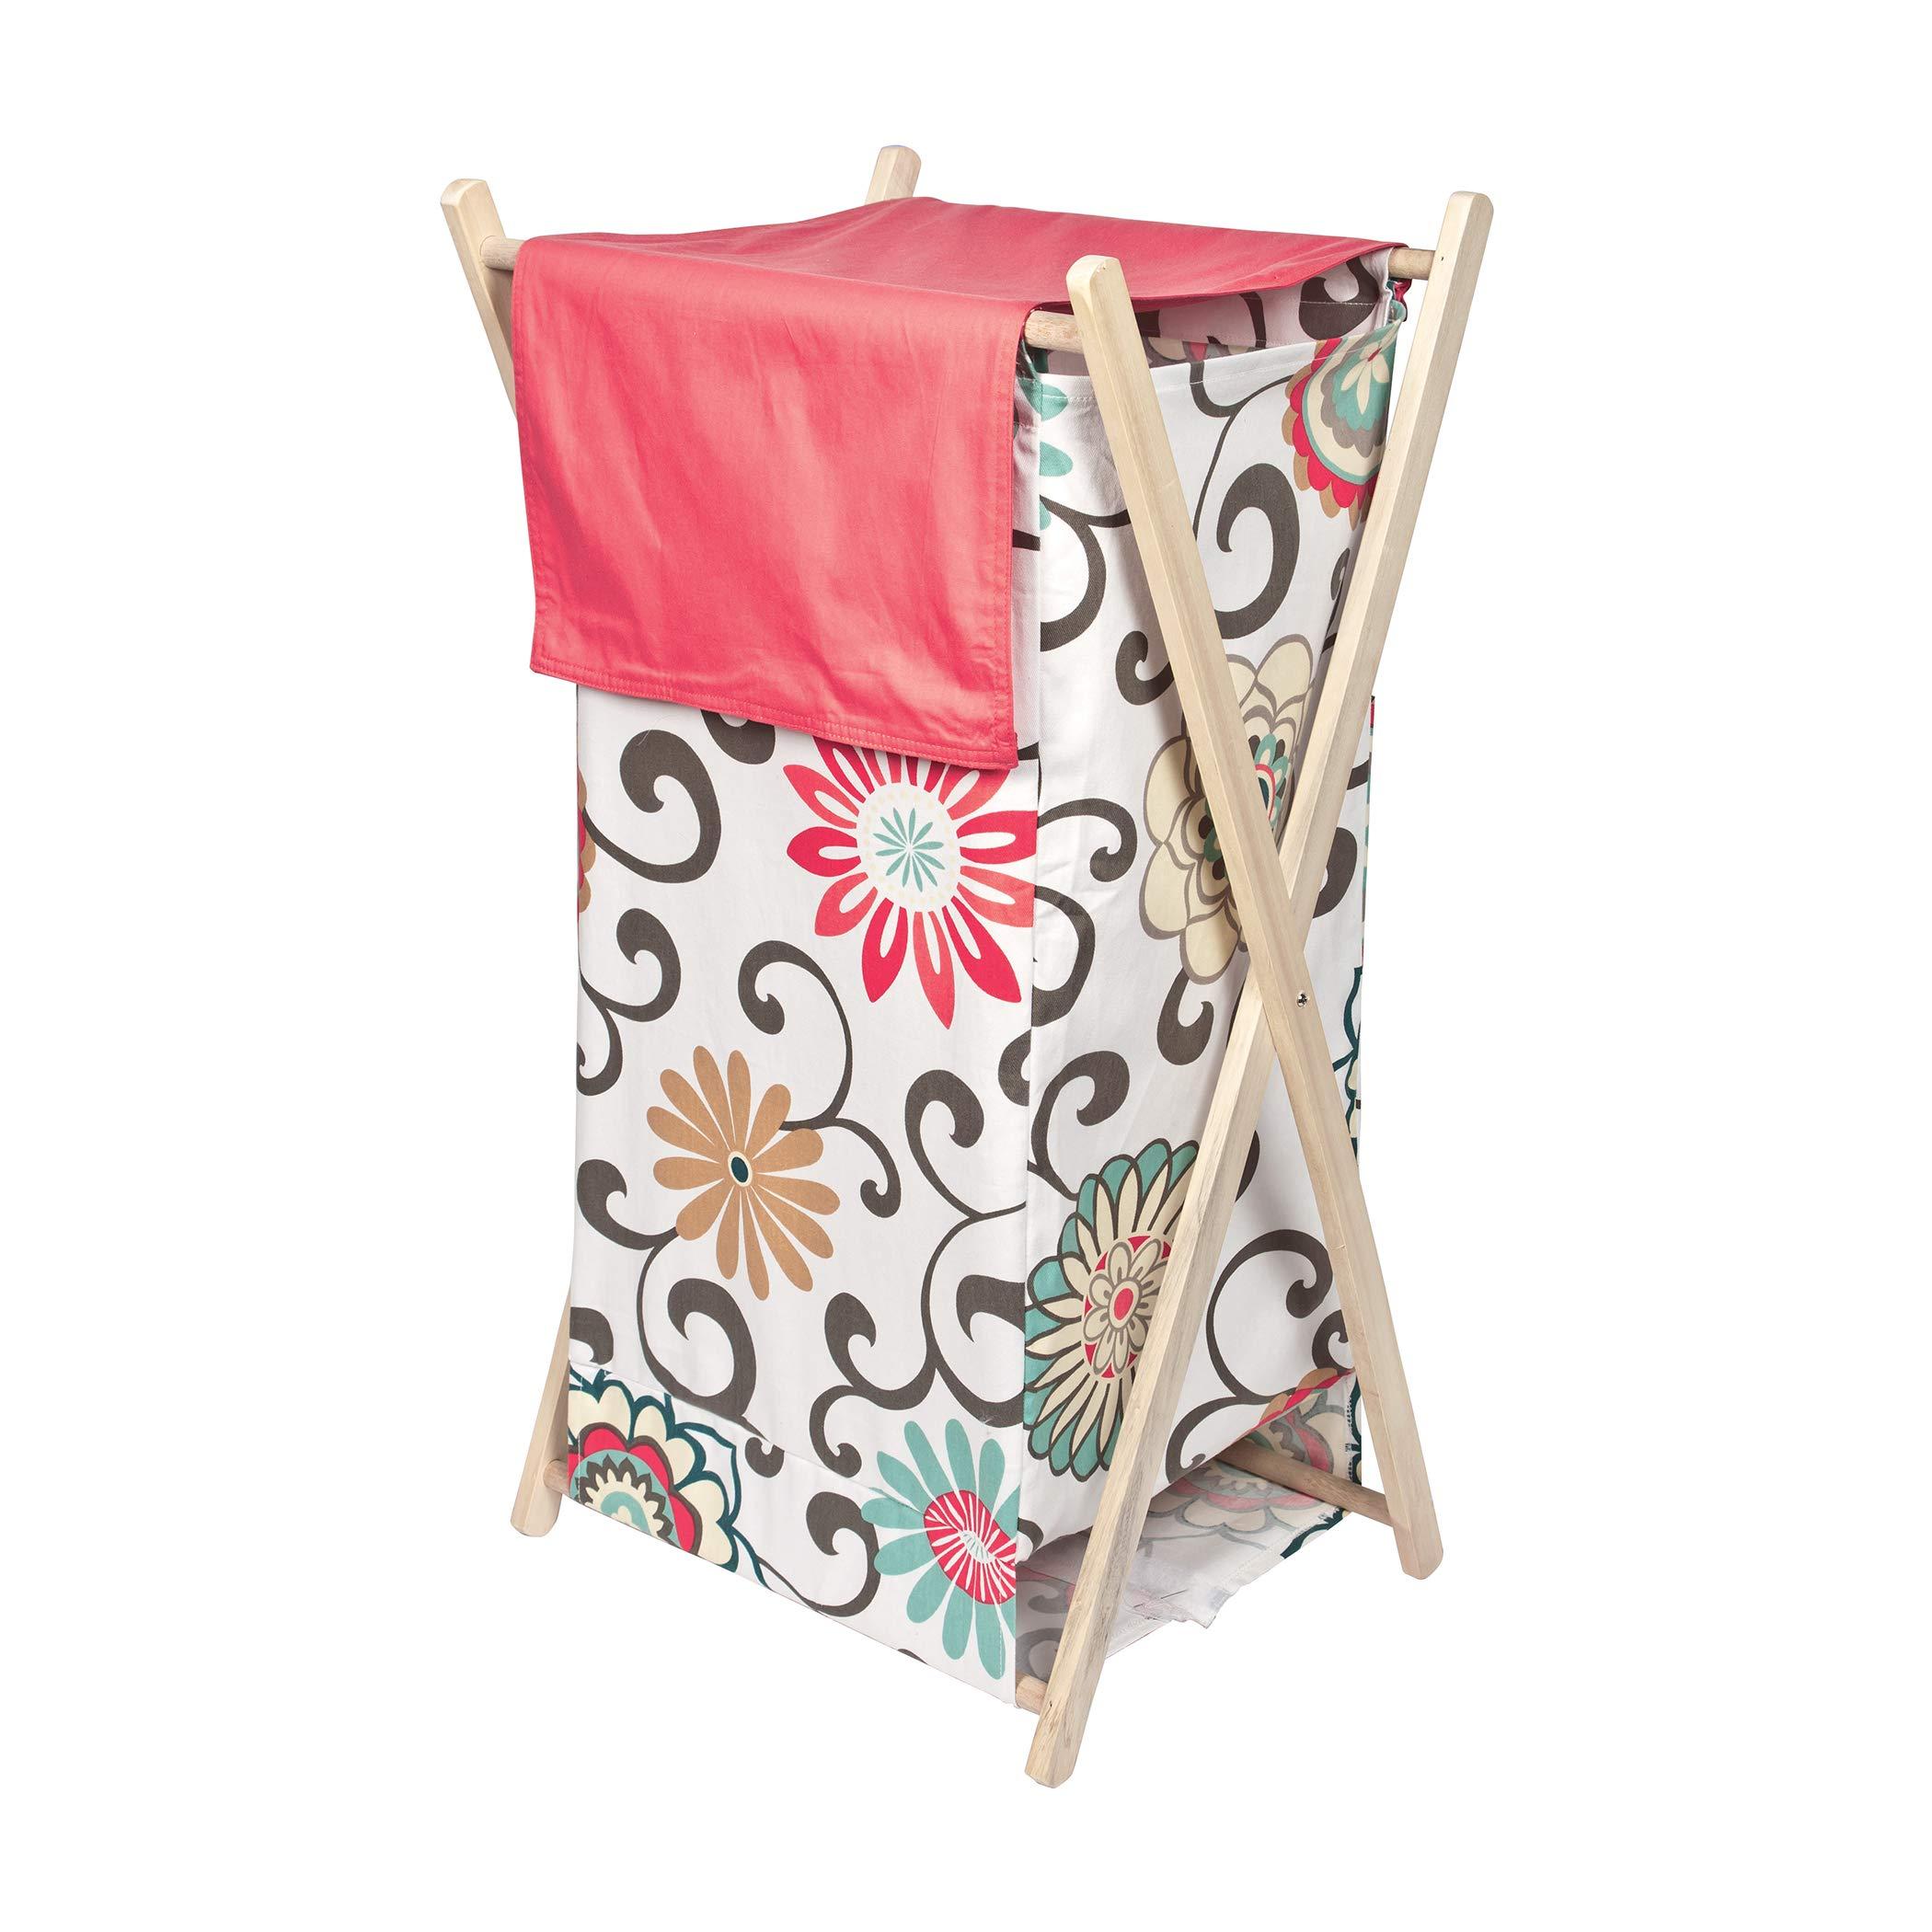 Storage Laundry Basket - Nursery Storage - Play Hamper Set by Basket Bins